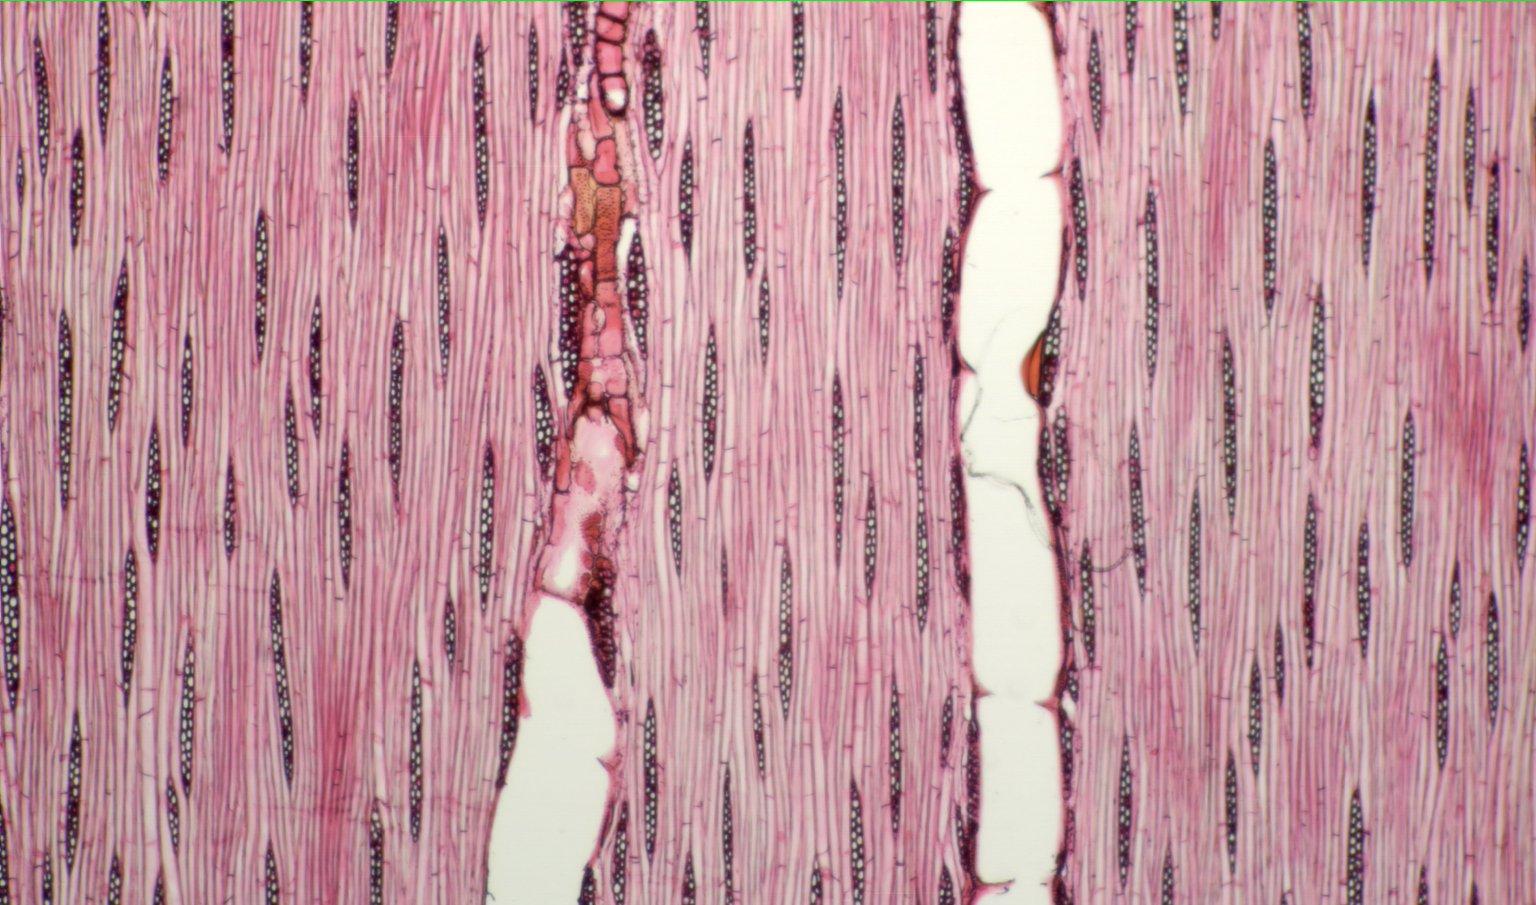 LEGUMINOSAE CAESALPINIOIDEAE Mimosoid Clade Piptadenia leucocarpa